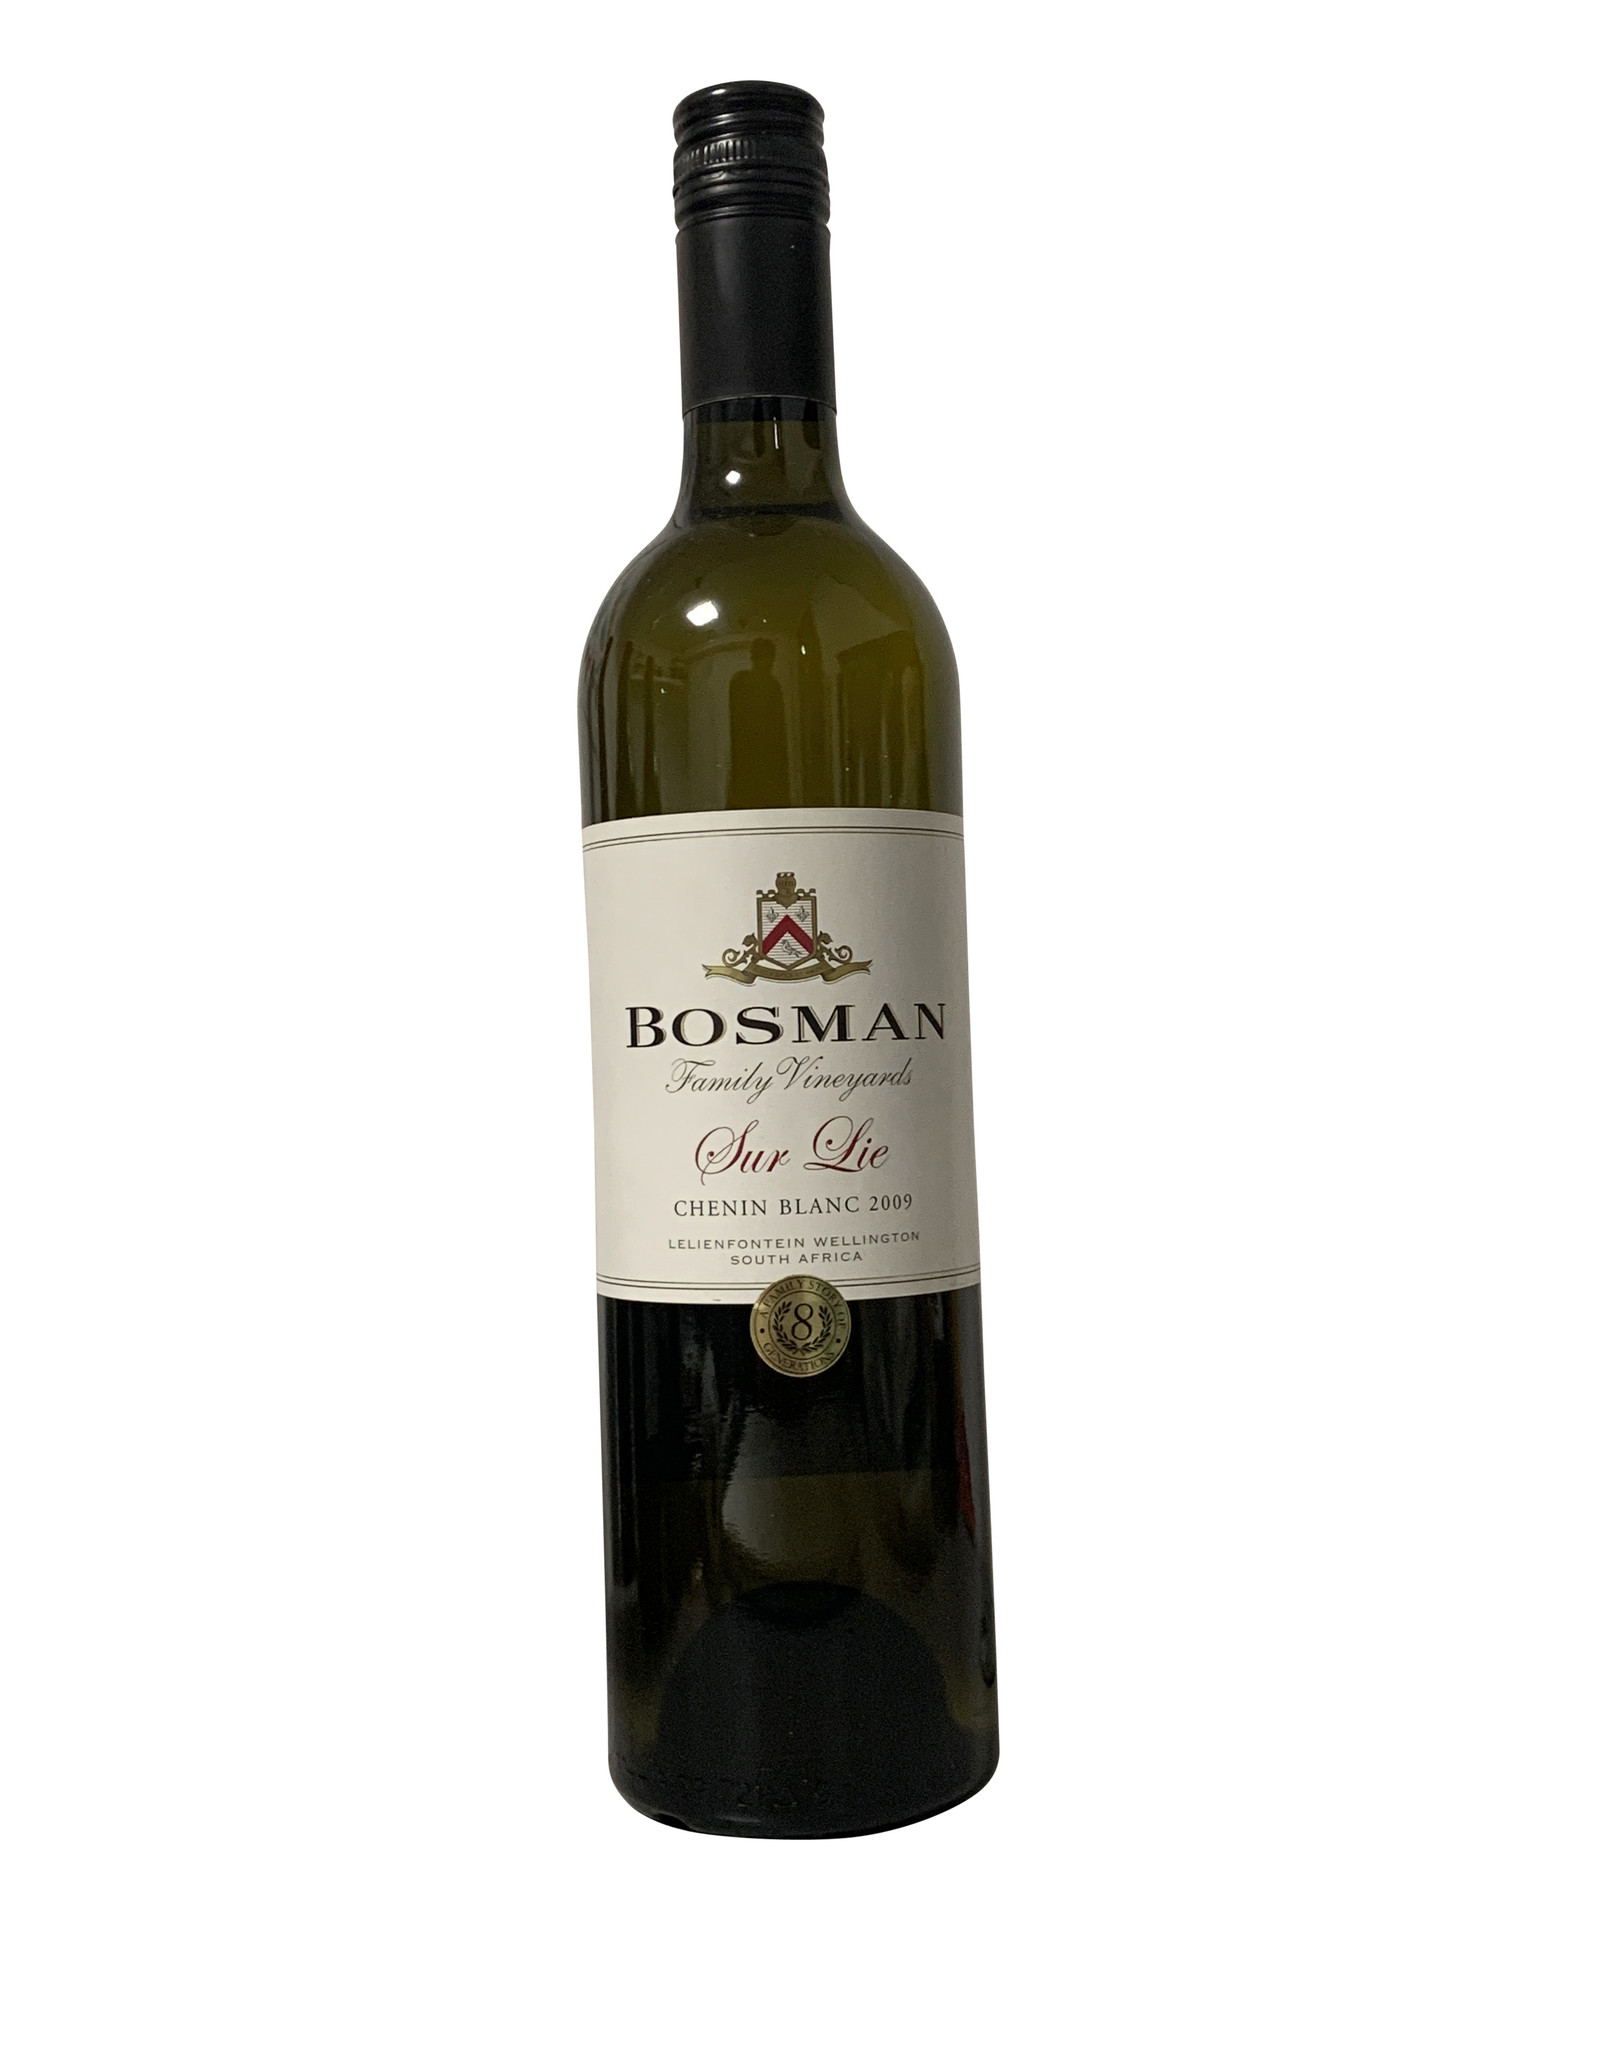 Bosman Family Vineyards Bosman Family Vineyards Sur Lie Chenin Blanc 2009, South Africa (750mL)